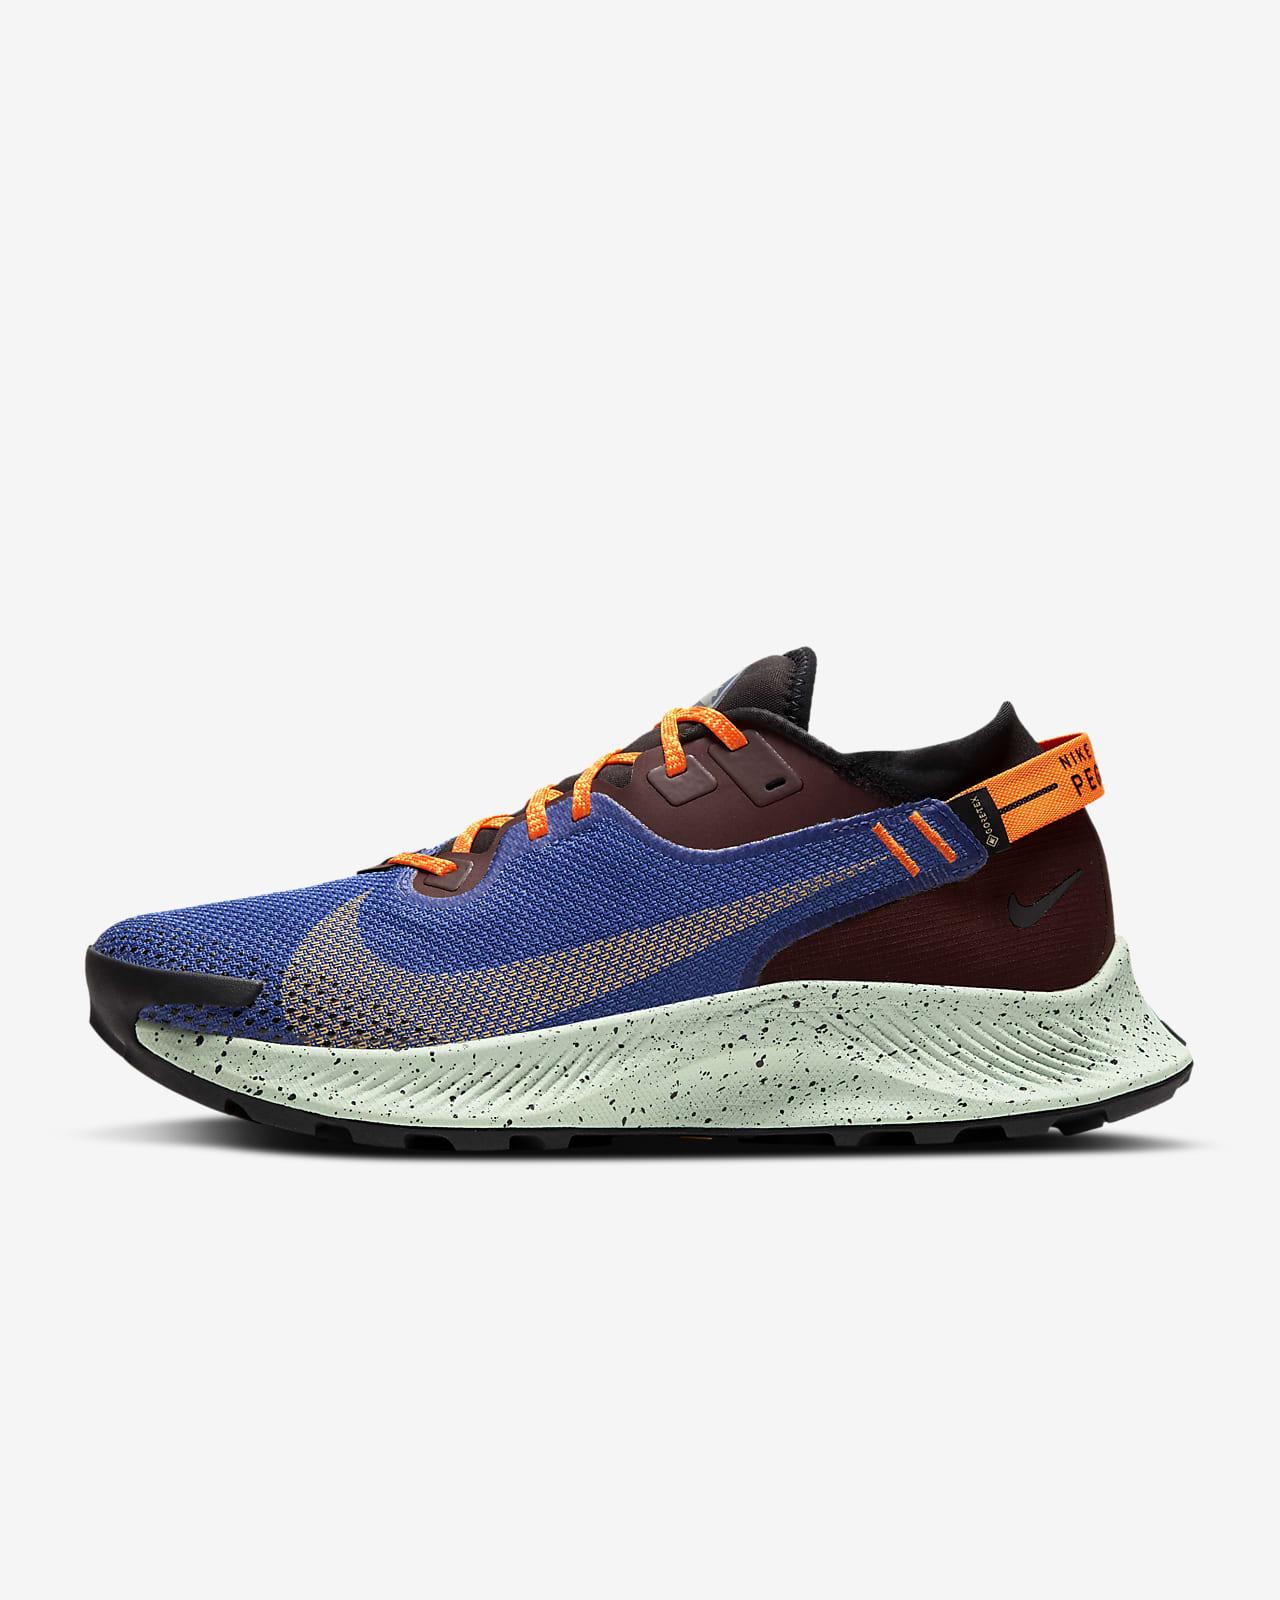 Nike Pegasus Trail 2 GORE-TEX Men's Trail Running Shoe